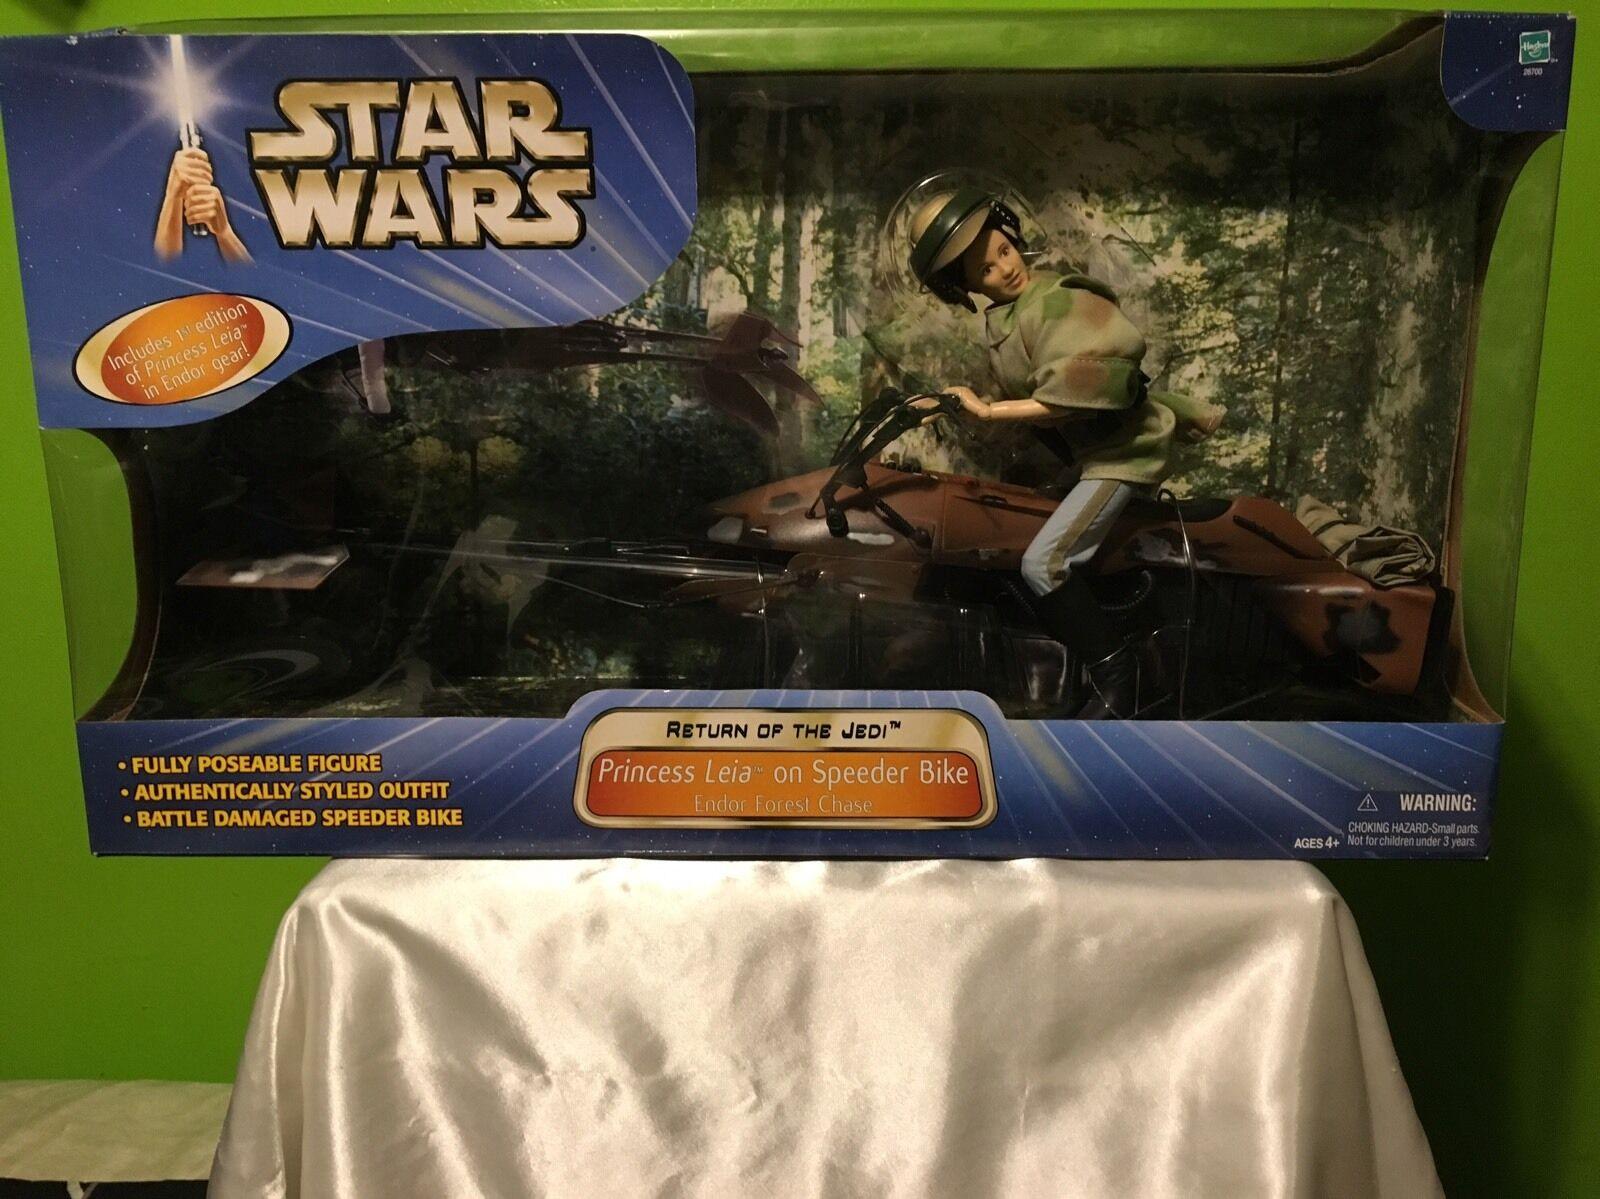 Nuevo sin abrir Star Wars Princesa Leia En Speeder Bike 12 Figura De Hasbro